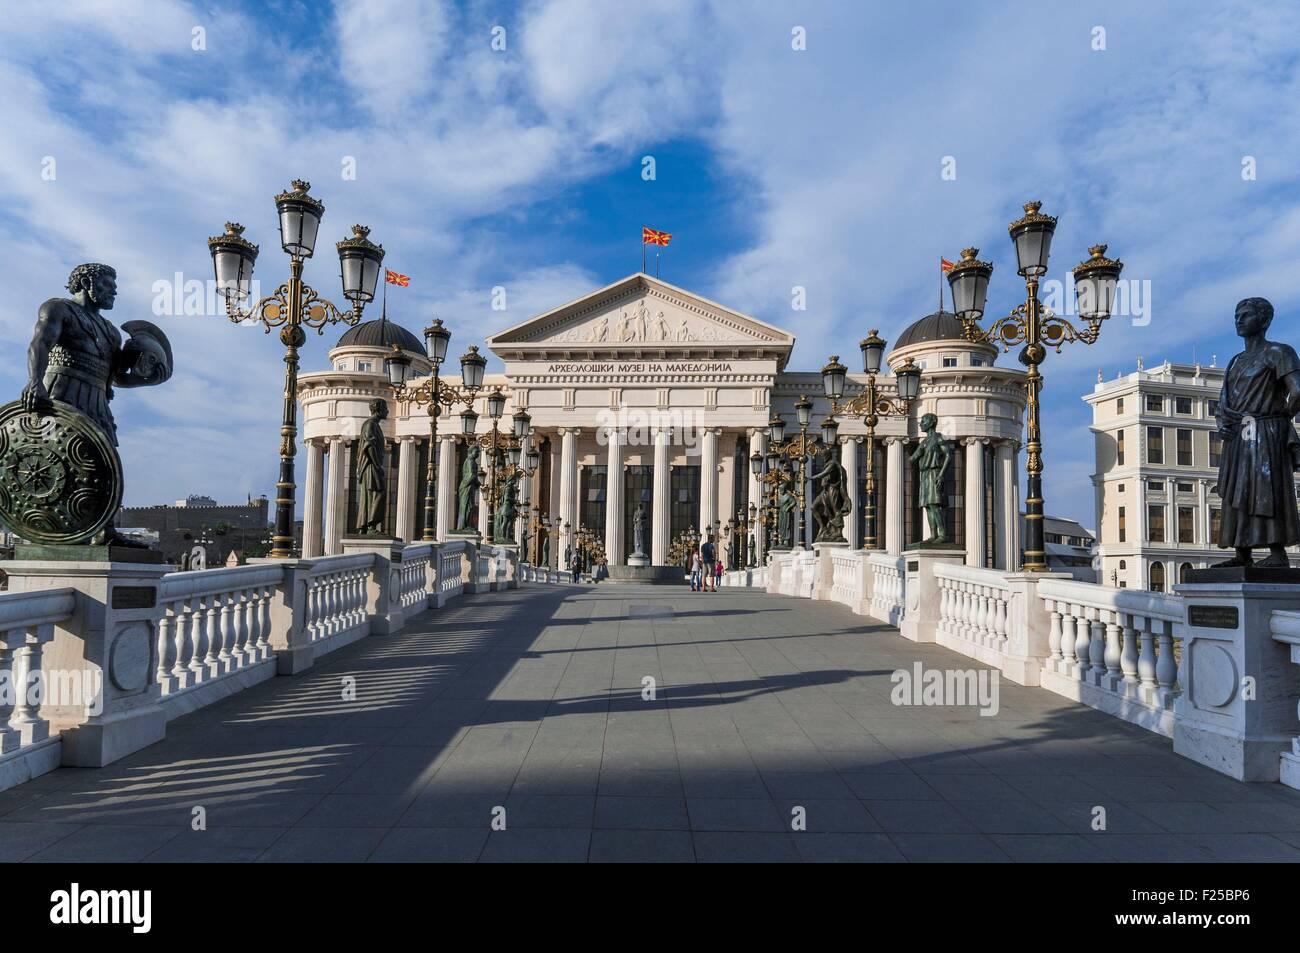 Macedonia, Skopje, downtown, new Civilisation Bridge and Macedonian Archeologilal Museum building - Stock Image